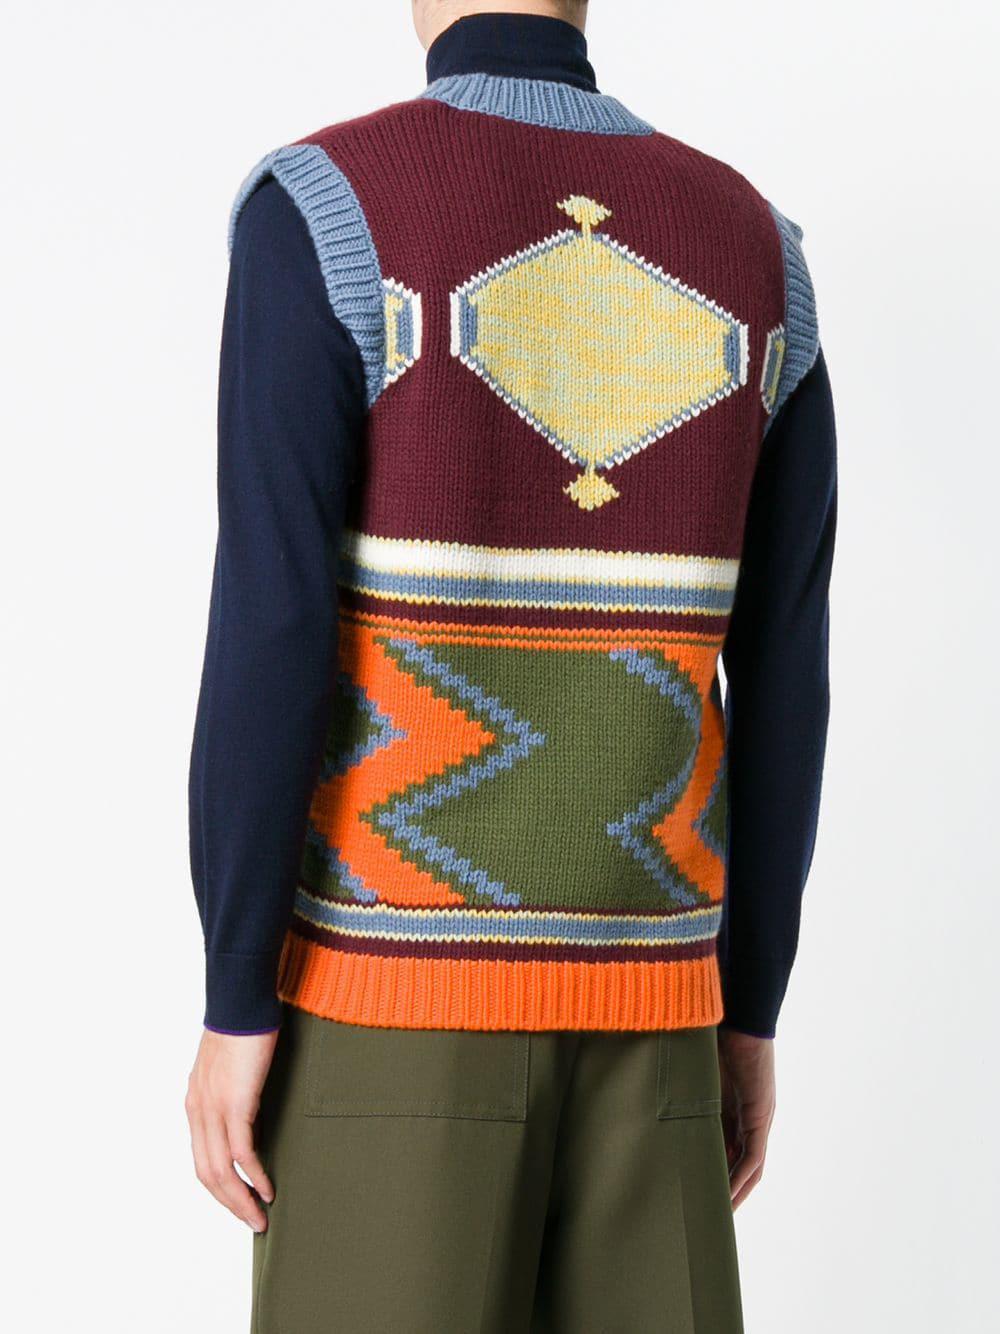 8a39e4740f66 Prada Intarsia V-neck Sweater Vest in Red for Men - Save 50% - Lyst